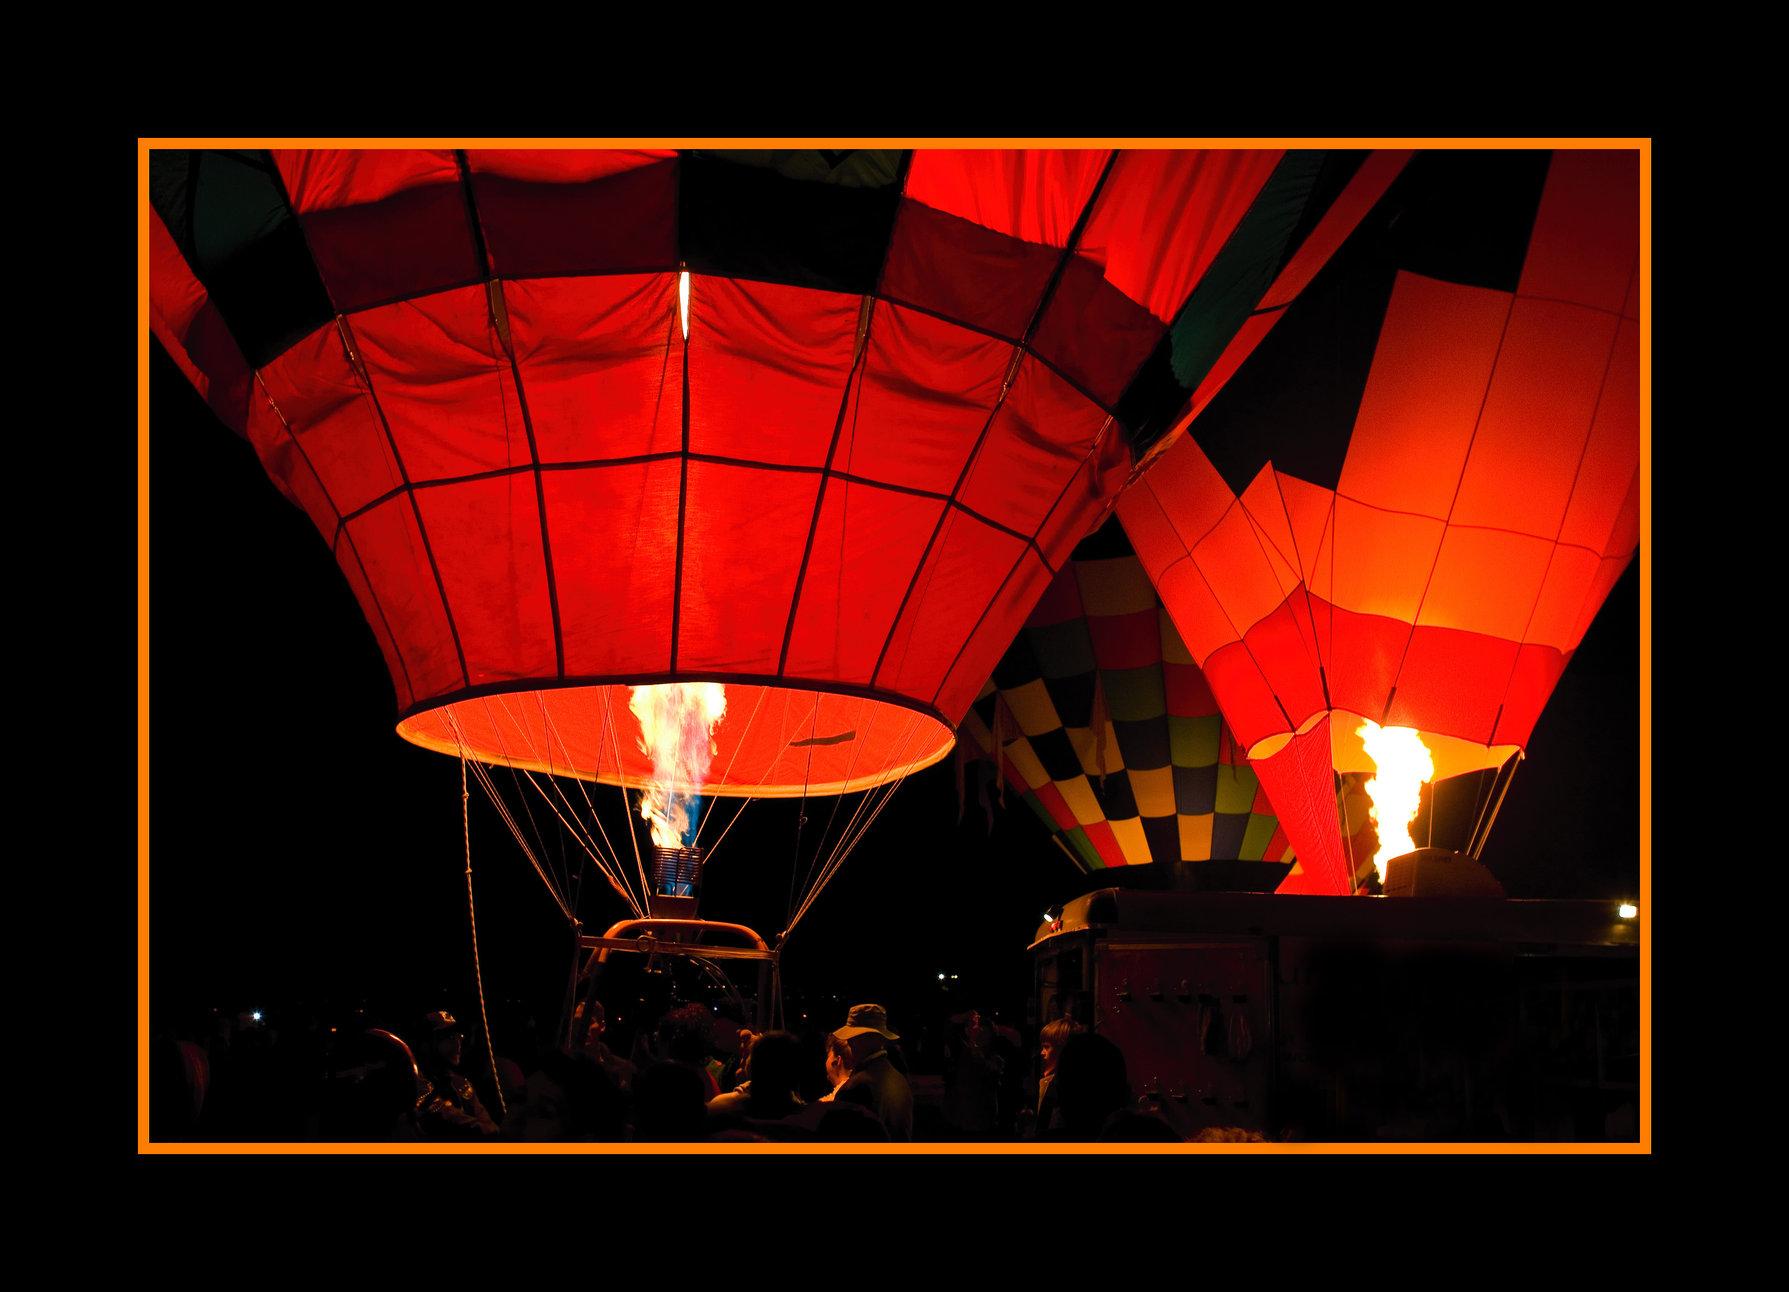 jpeg-albq-balloons-5921.jpg